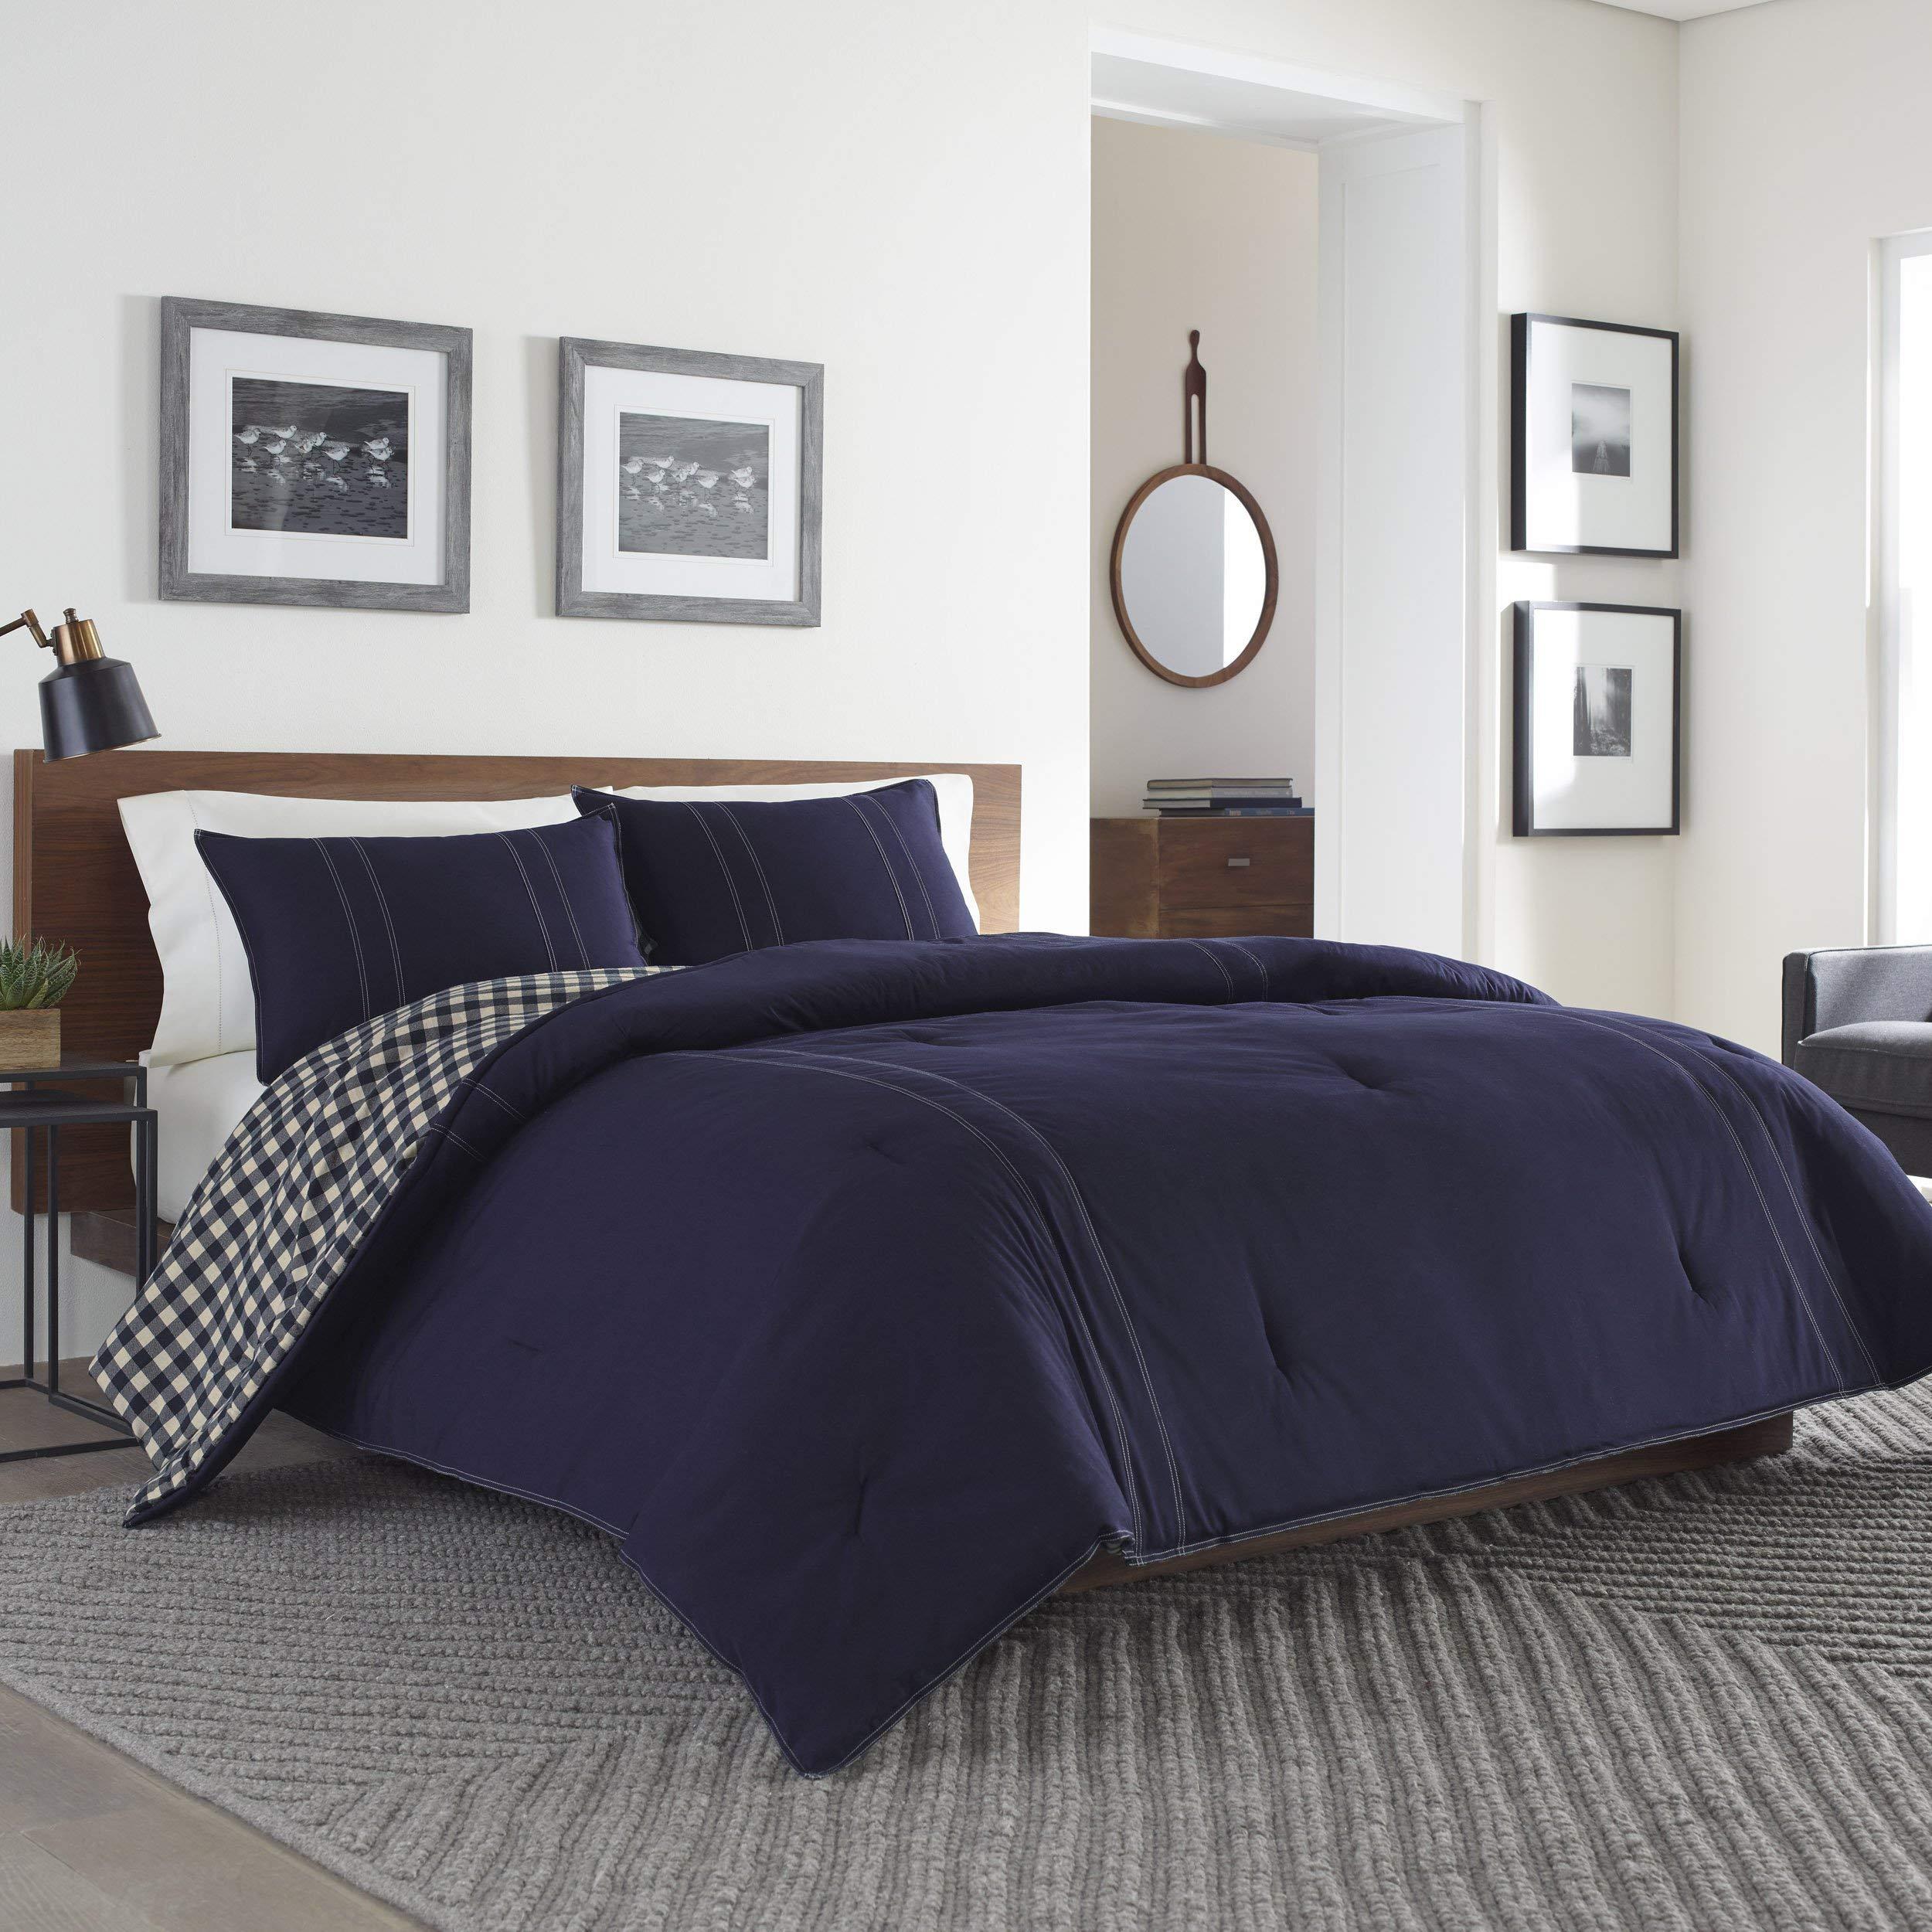 Eddie Bauer 216693 Kingston Reversible Comforter Set, Full/Queen, Navy